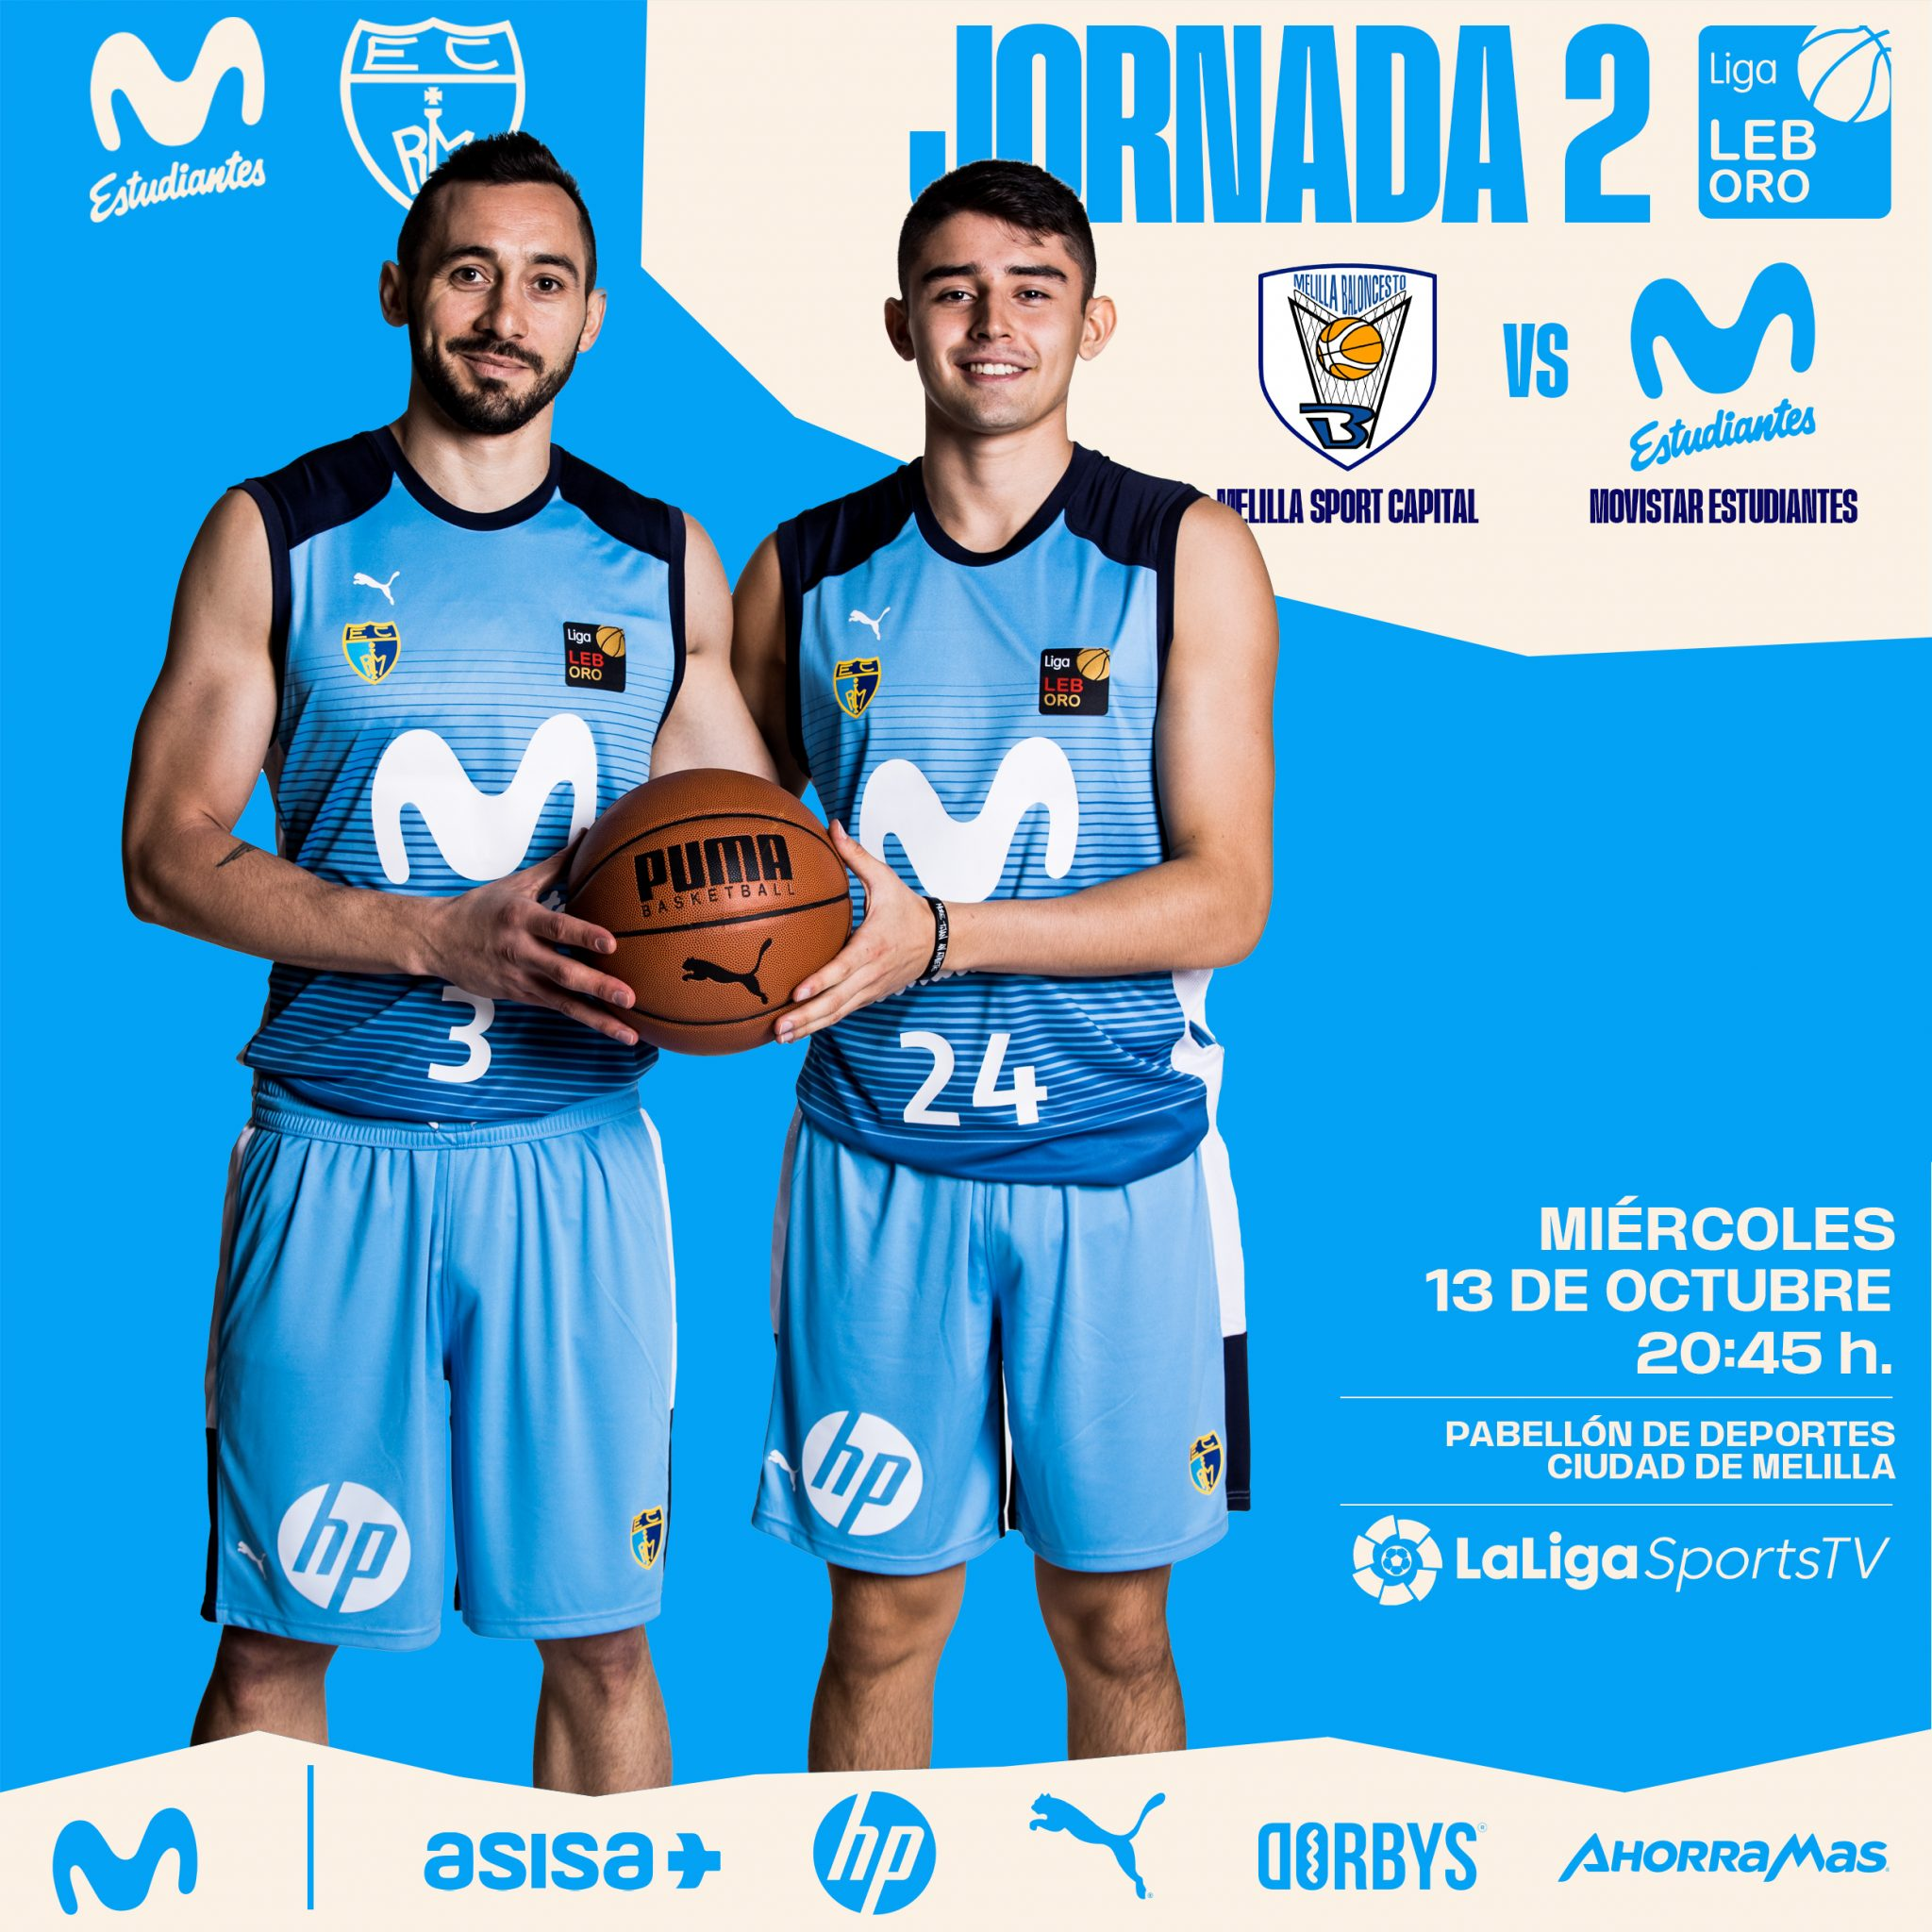 LEB: Melilla, el primer viaje (miércoles, 20:45h, LaLigaSportsTV)